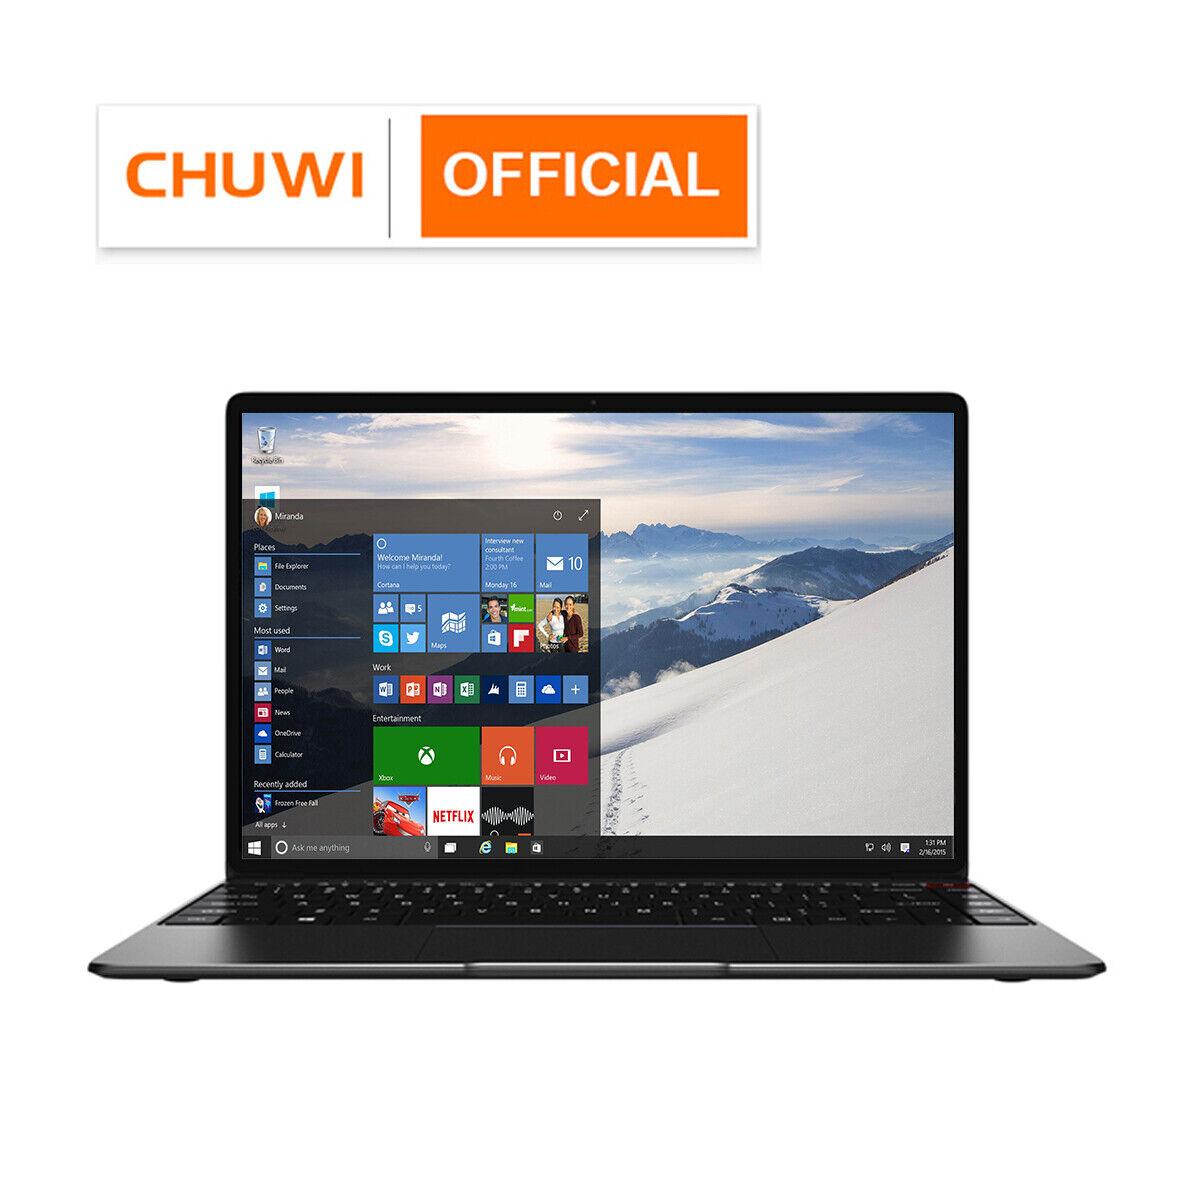 CHUWI HeroBook Pro 14.1 in Laptop Windows 10 Intel Dual Core 8+256G Notebook PC 1